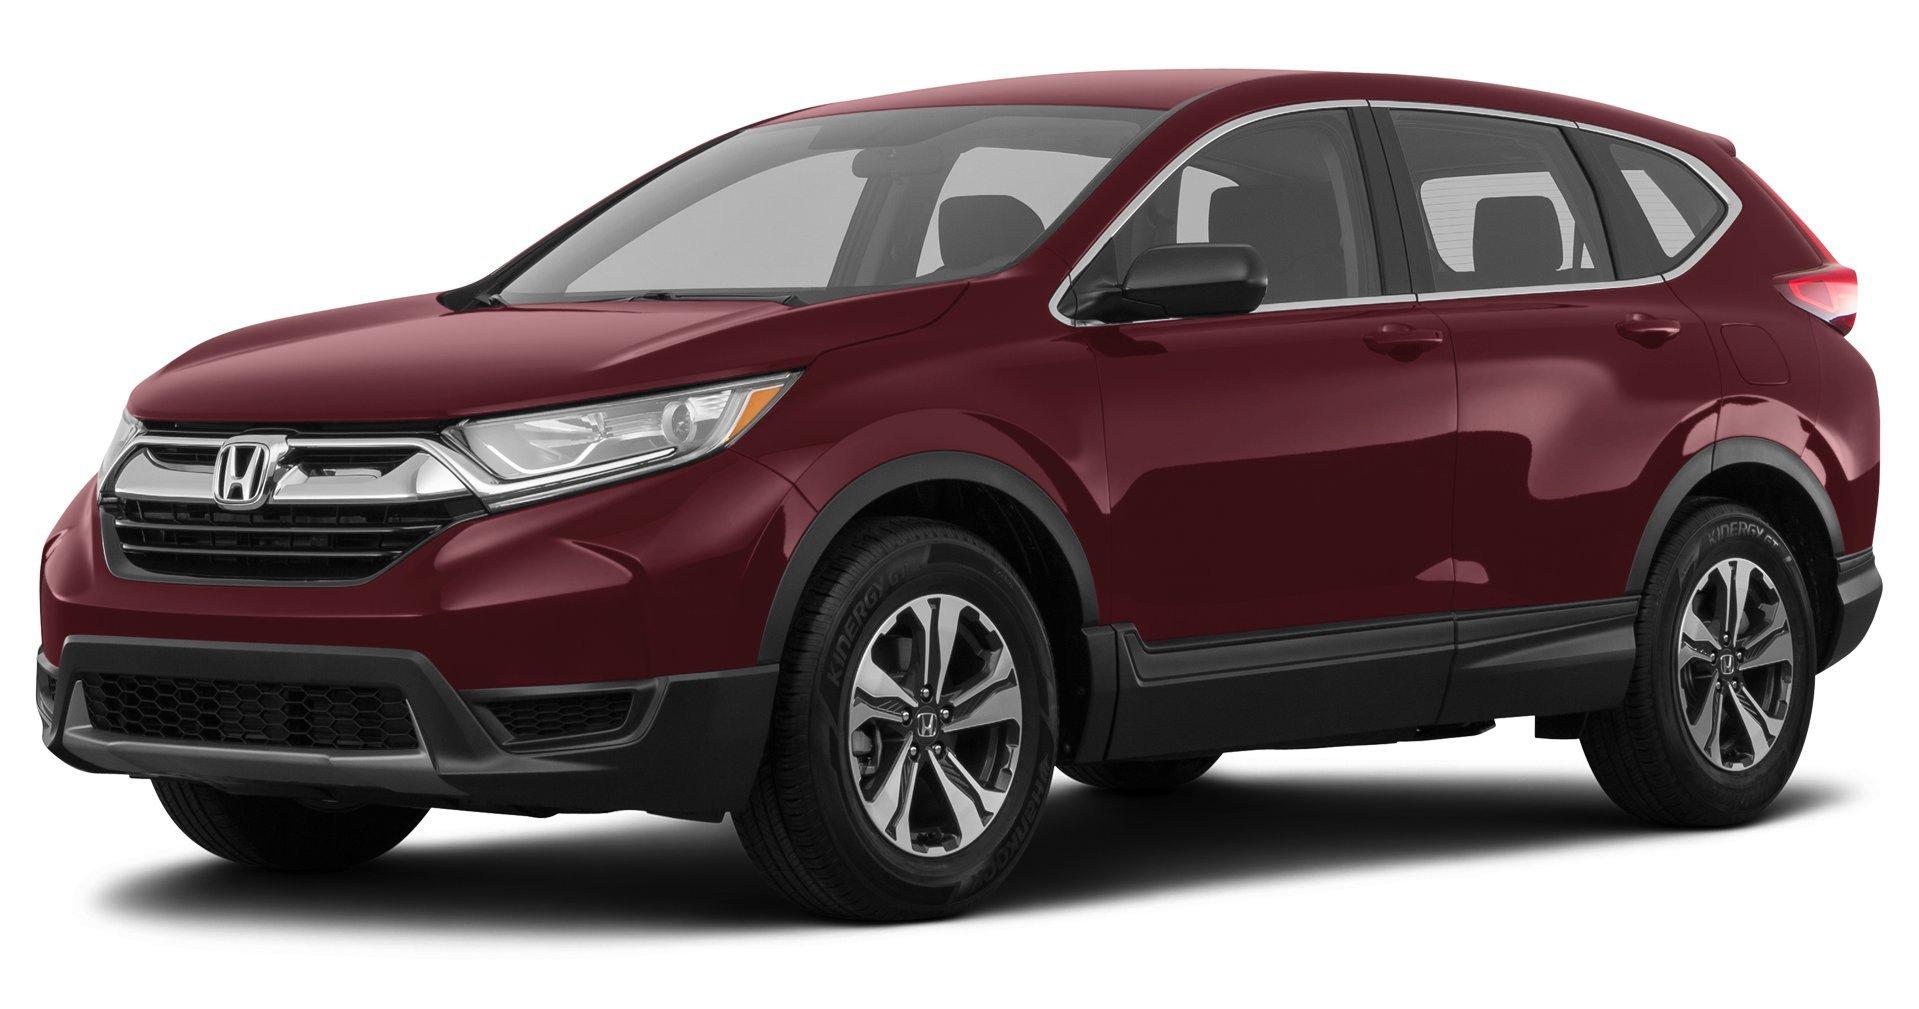 Amazon.com: 2018 Honda CR-V Reviews, Images, and Specs: Vehicles